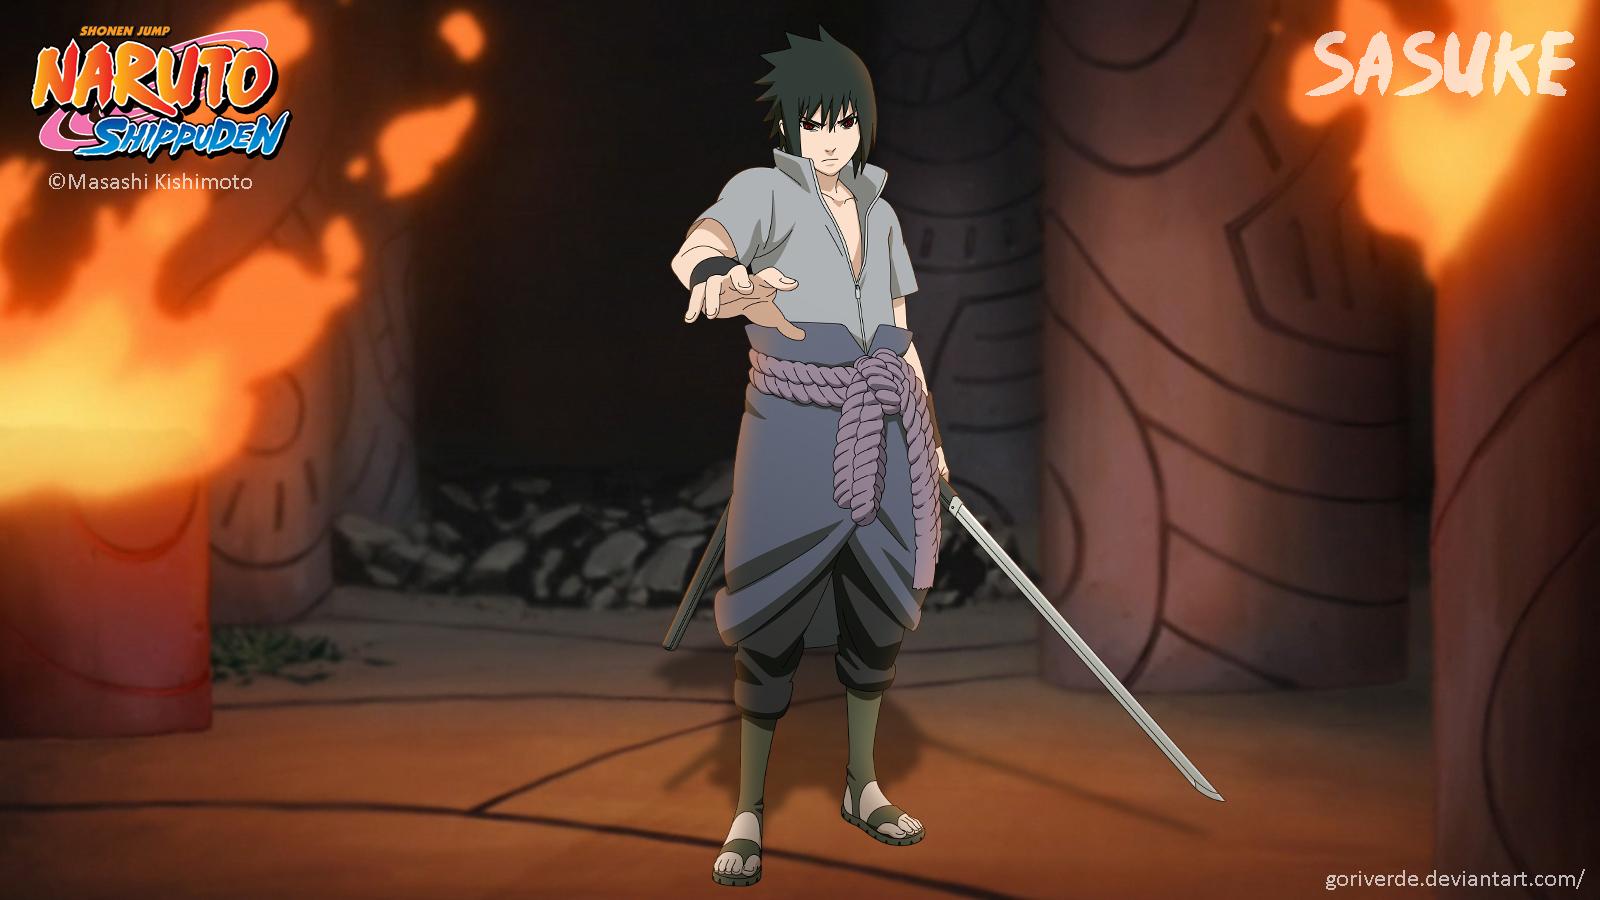 Sasuke by goriverde